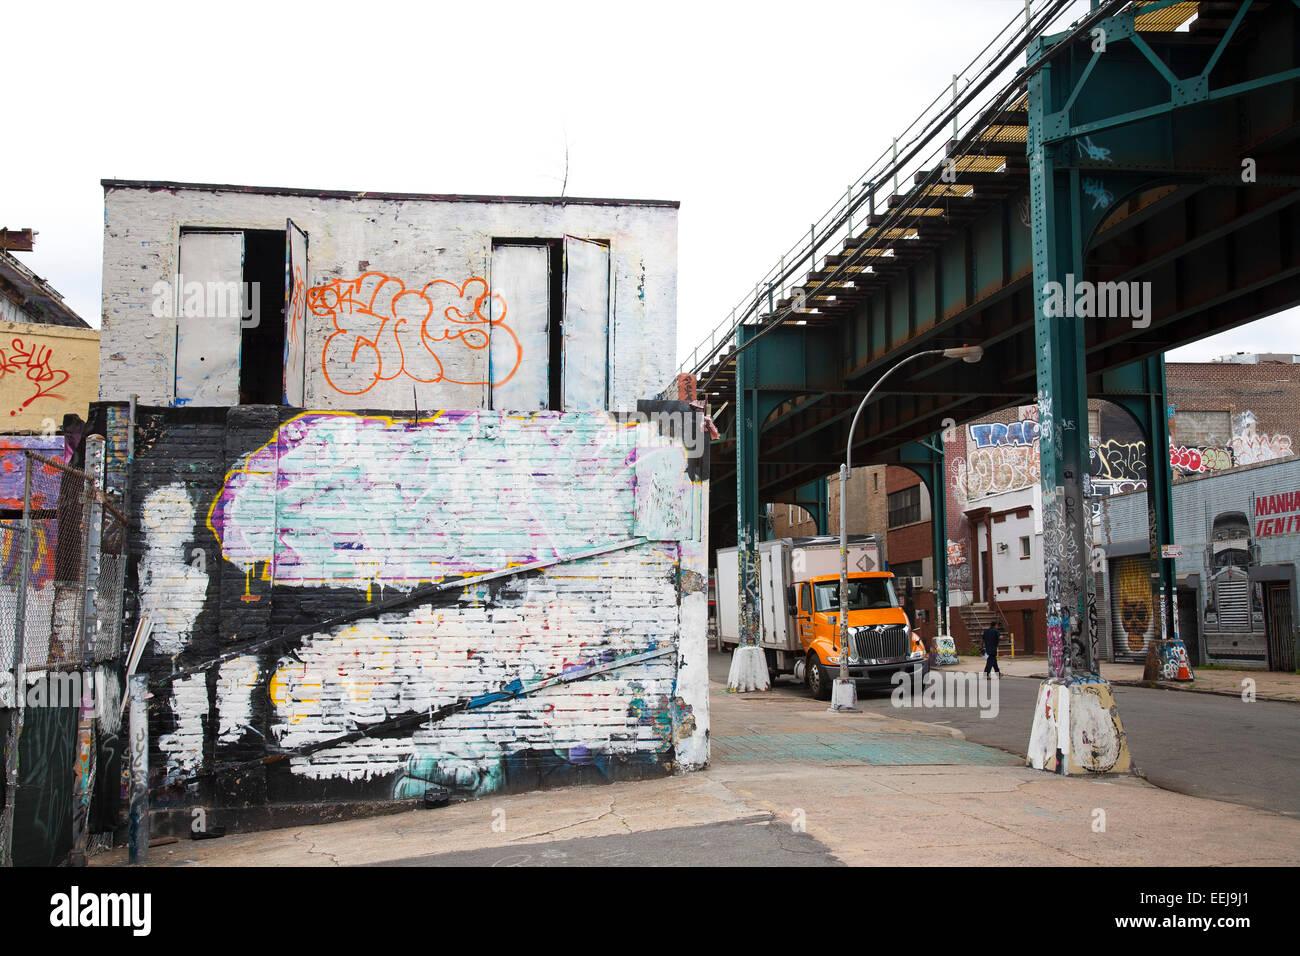 Graffiti wall in queens ny - Graffiti 5 Pointz Davis Street Neighborhood Of Queens New York Usa